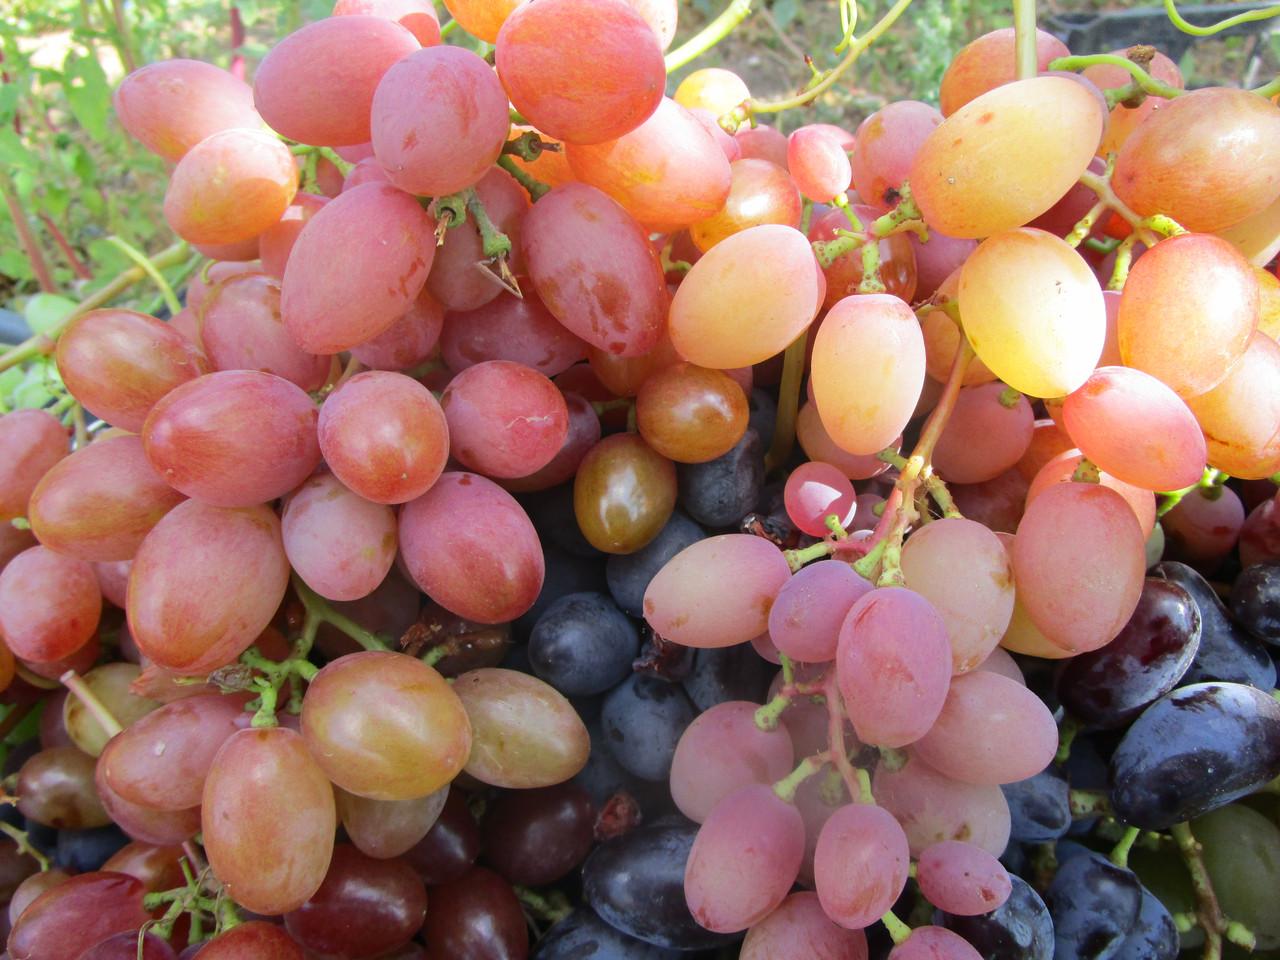 Сорт винограда сенсация: описание, фото